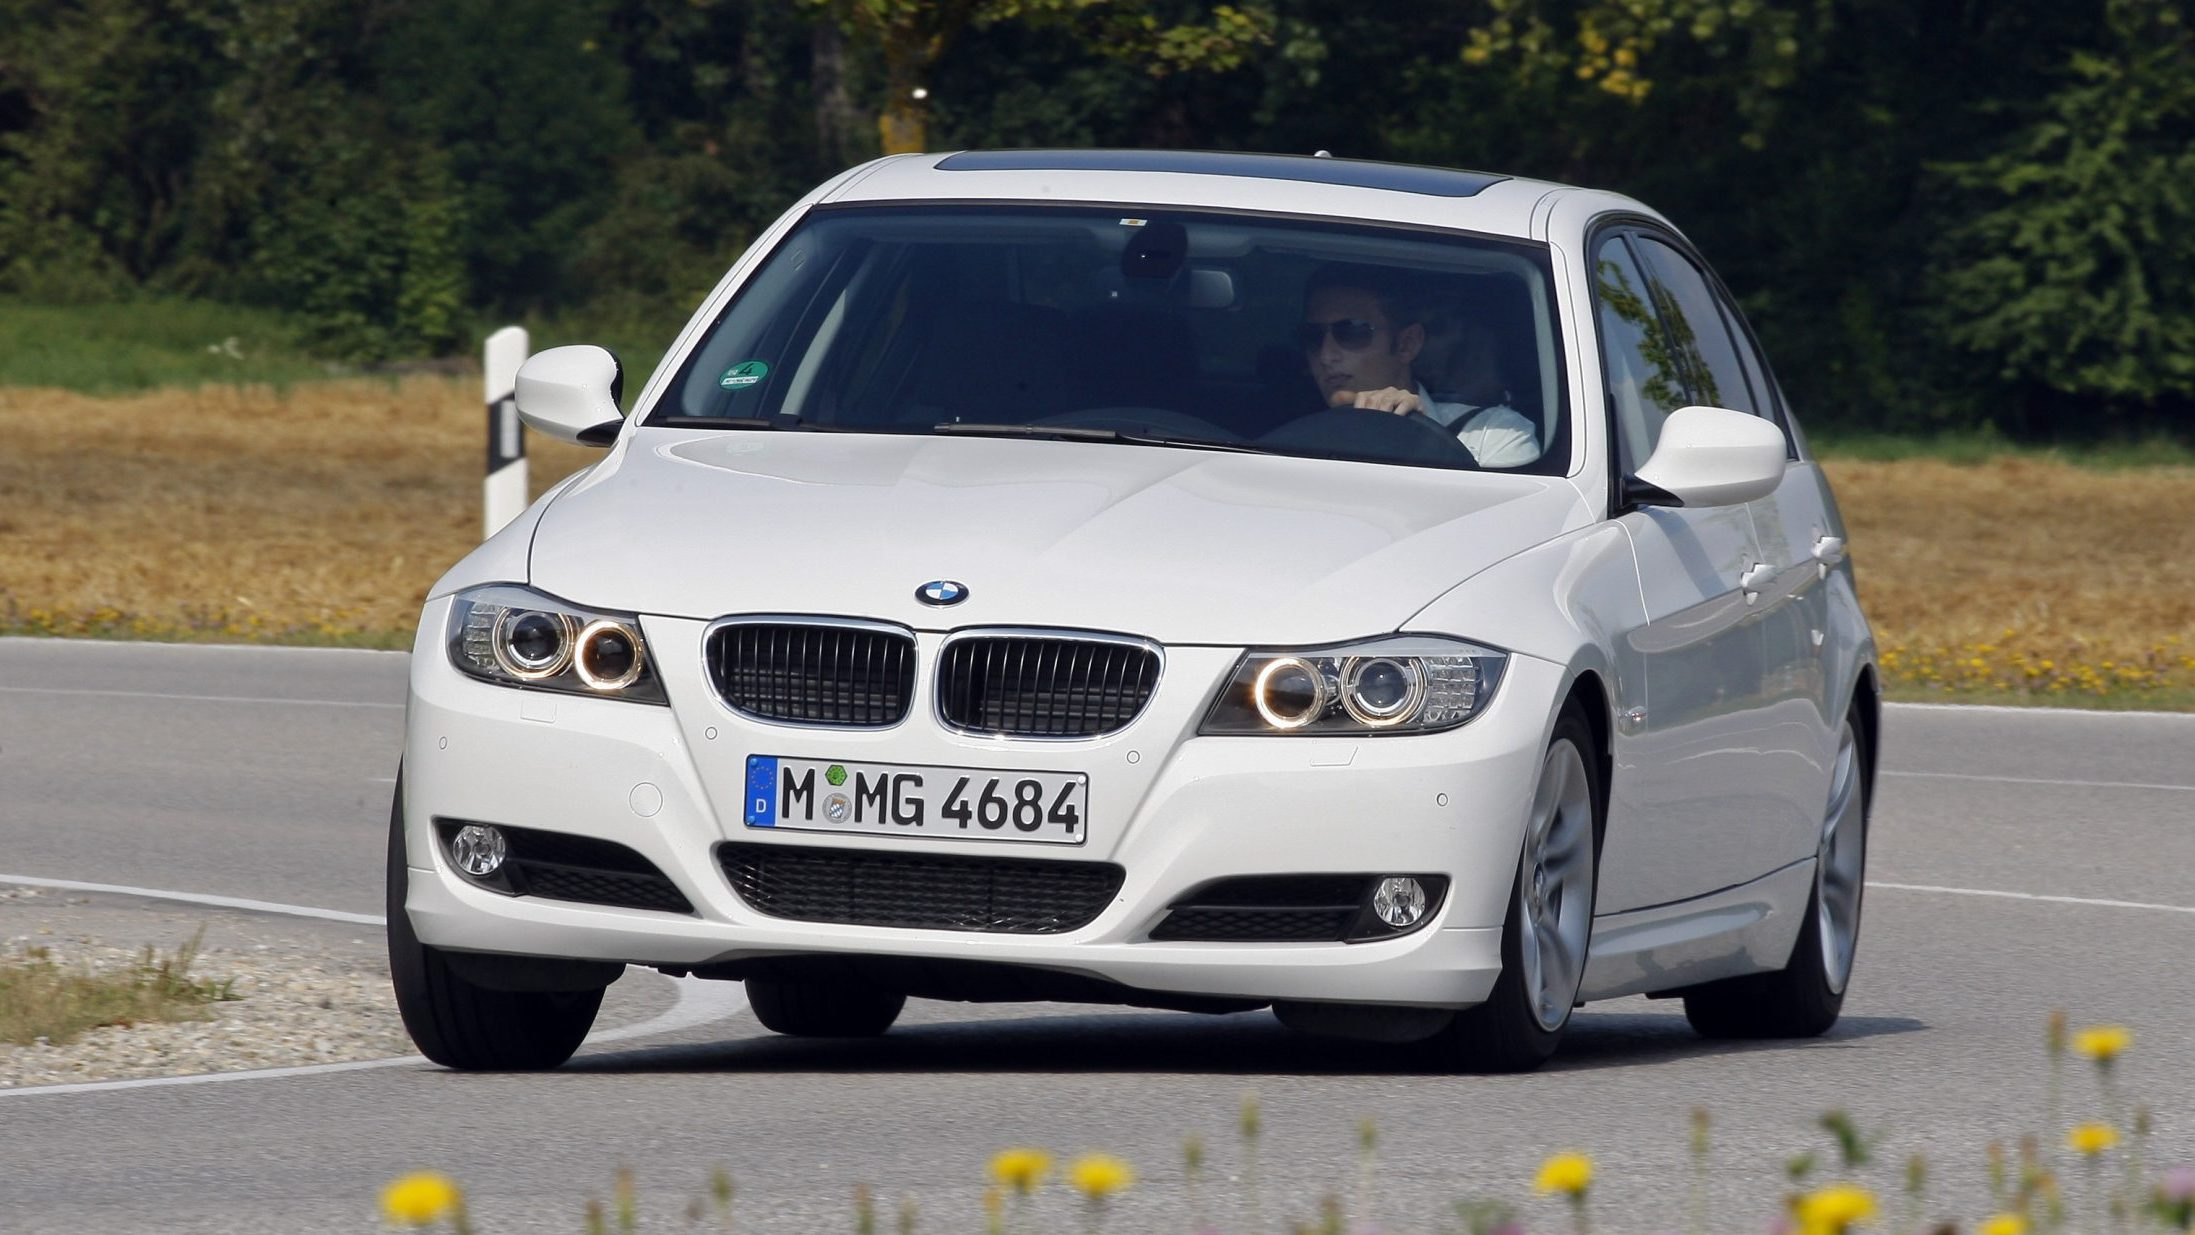 koppakking vervangen BMW E91 Touring 3-serie